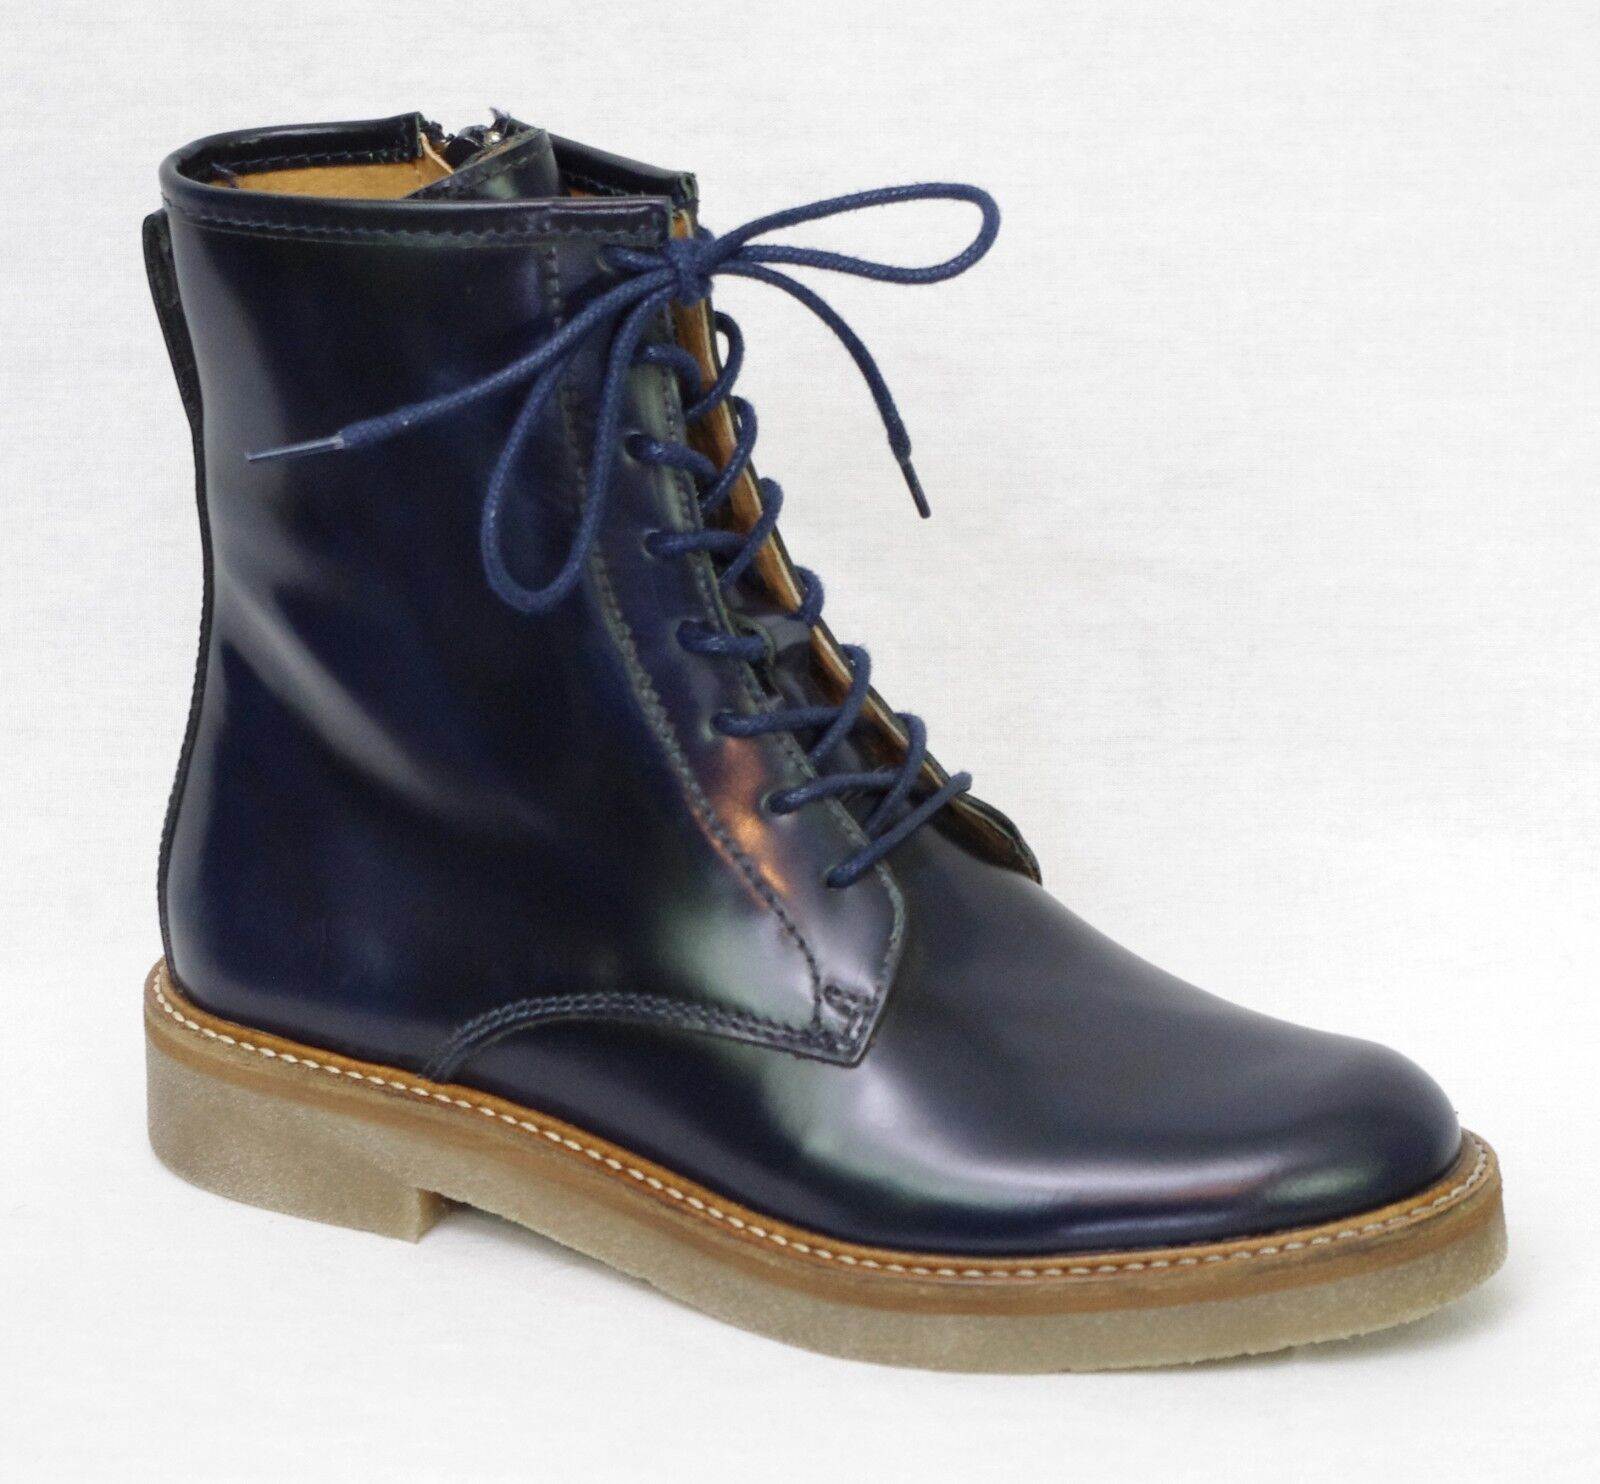 KICKERS OXFORDO Bottines Boots cuir bleu marine femme 512110 5